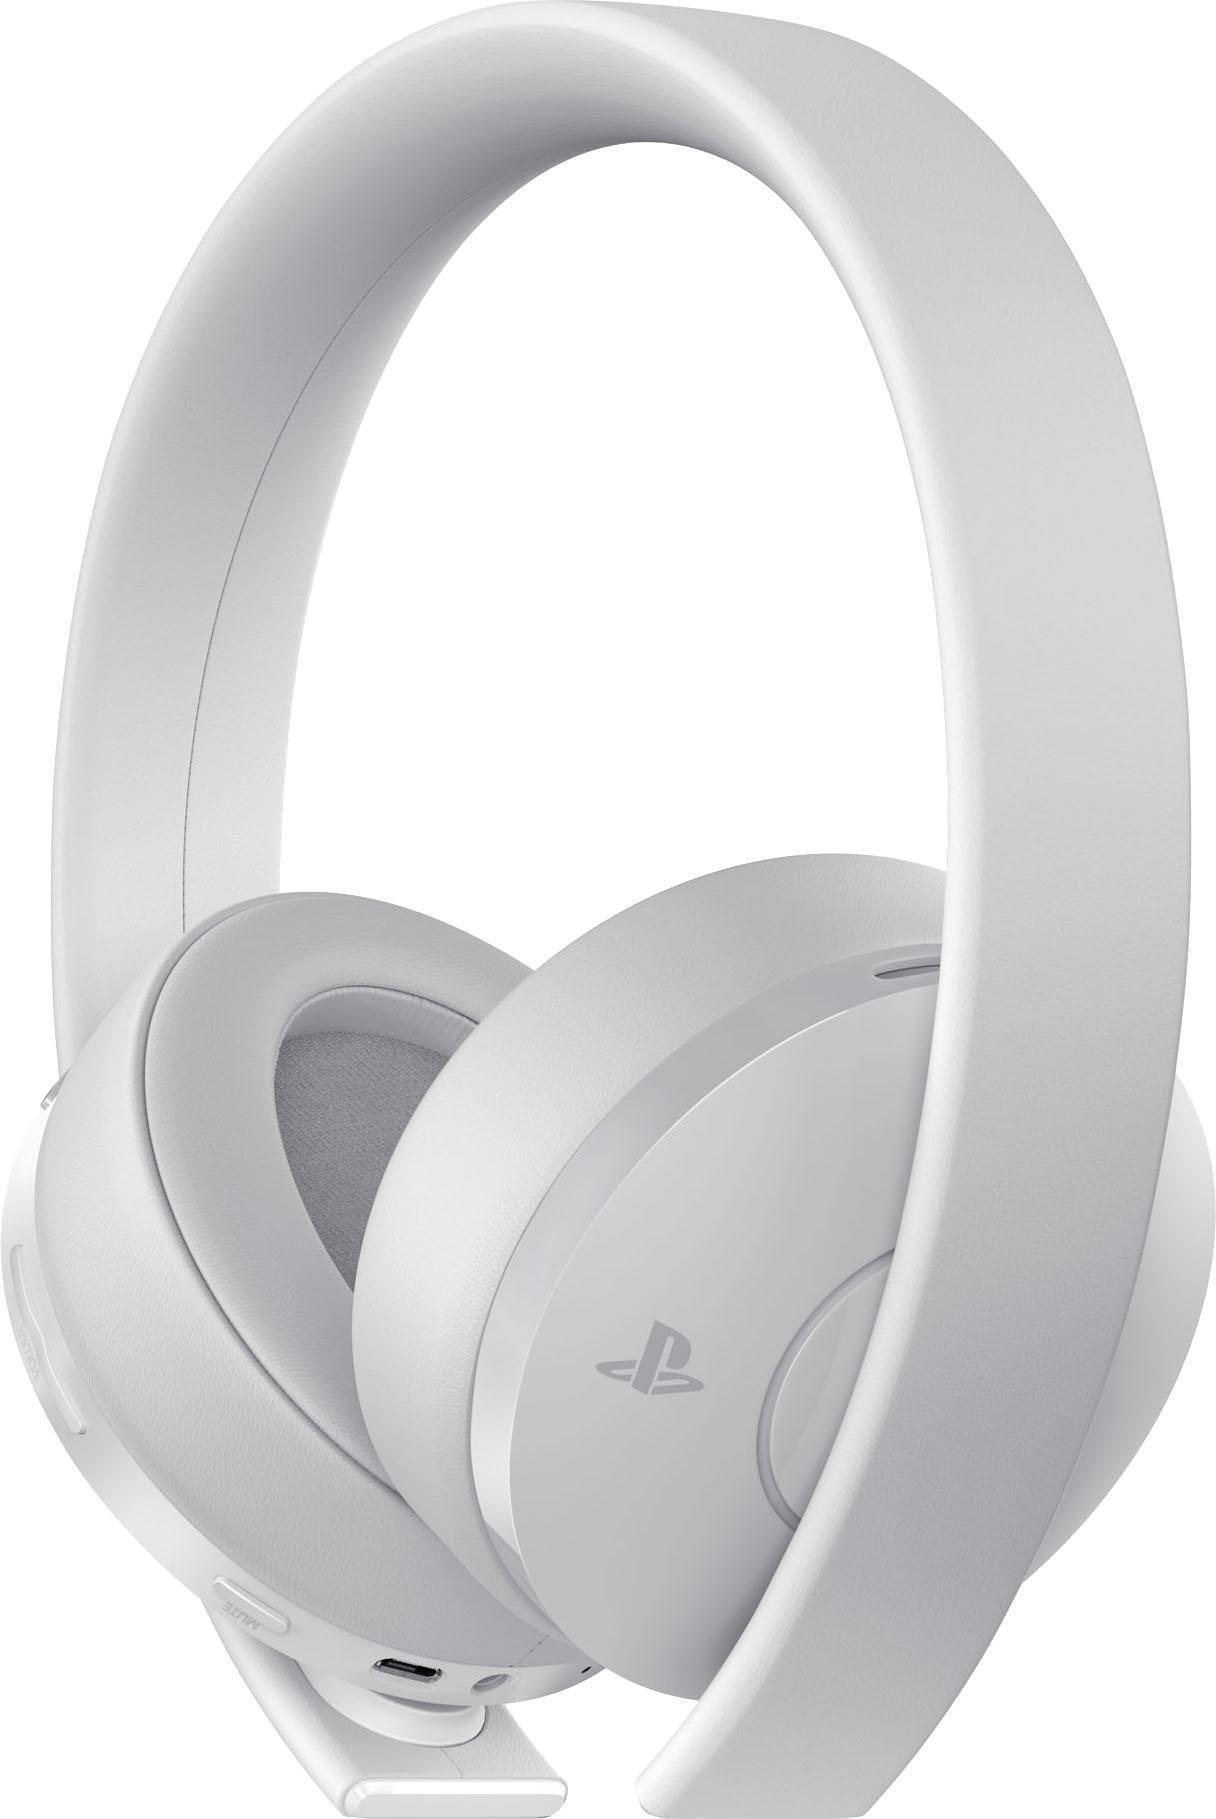 »GOLD« Wireless-Headset (Rauschunterdrückung)